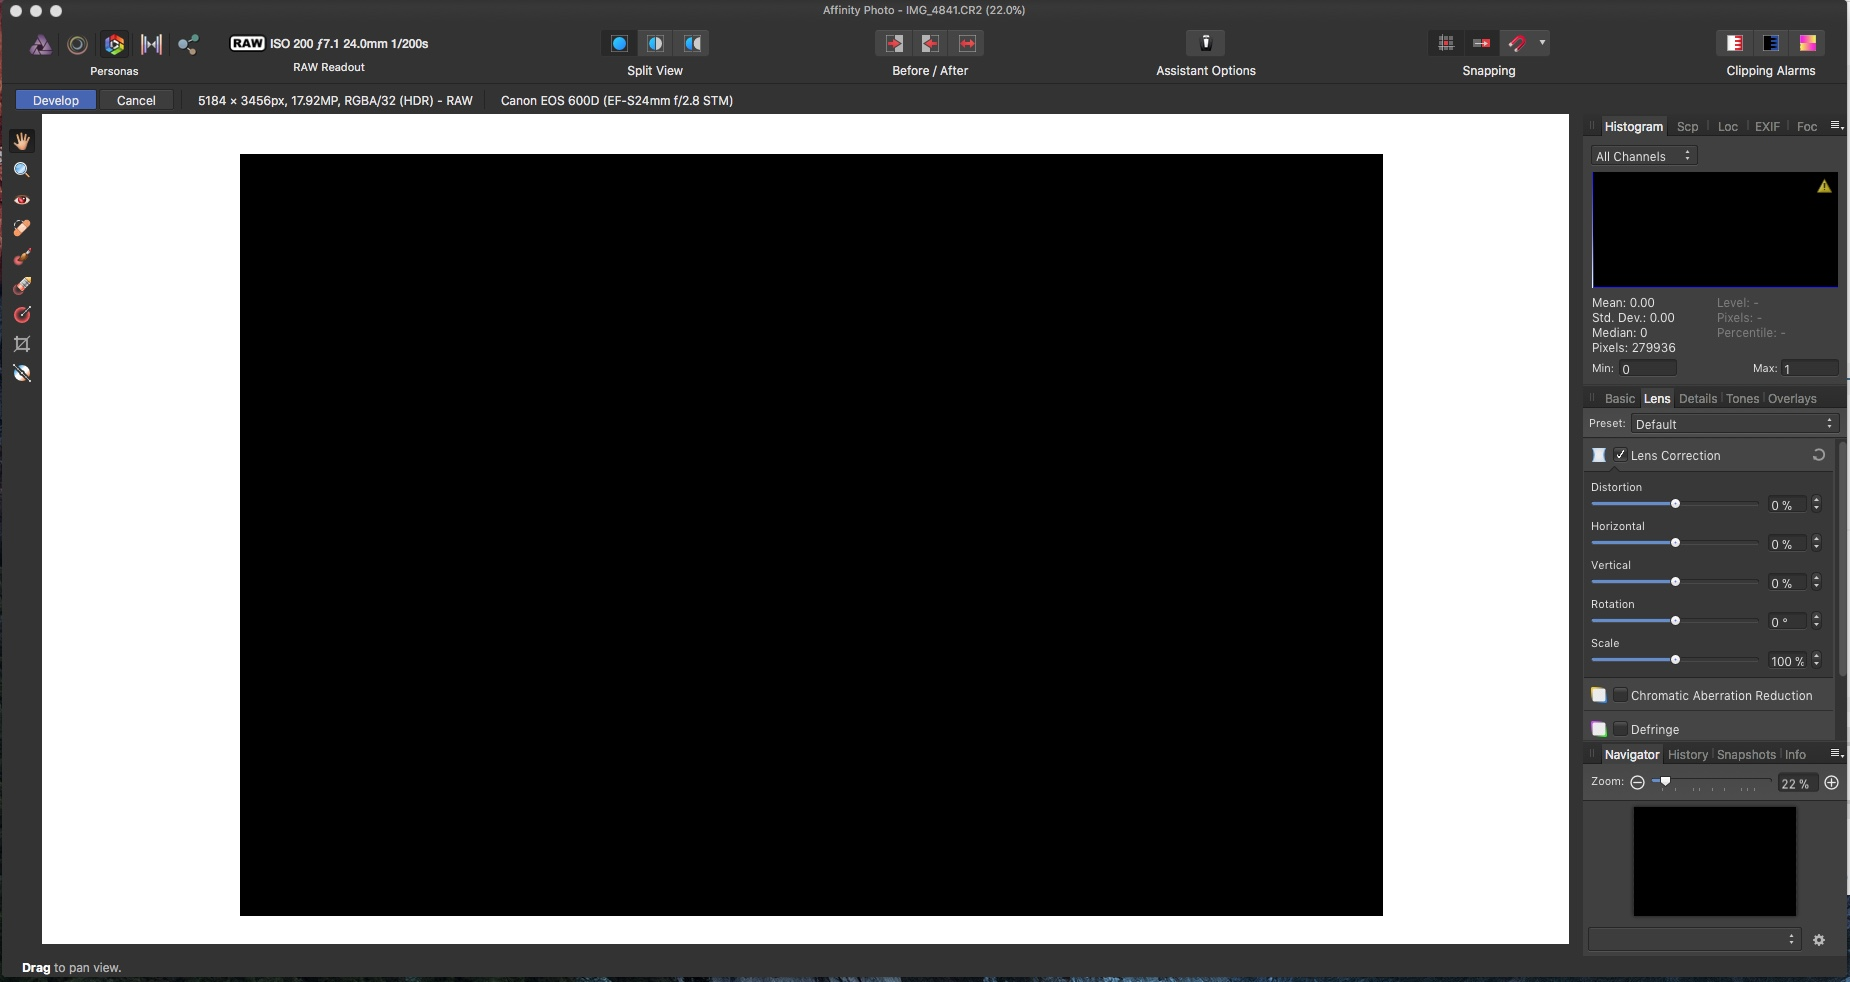 Apple Raw Engine malfunction - Affinity on Desktop Questions